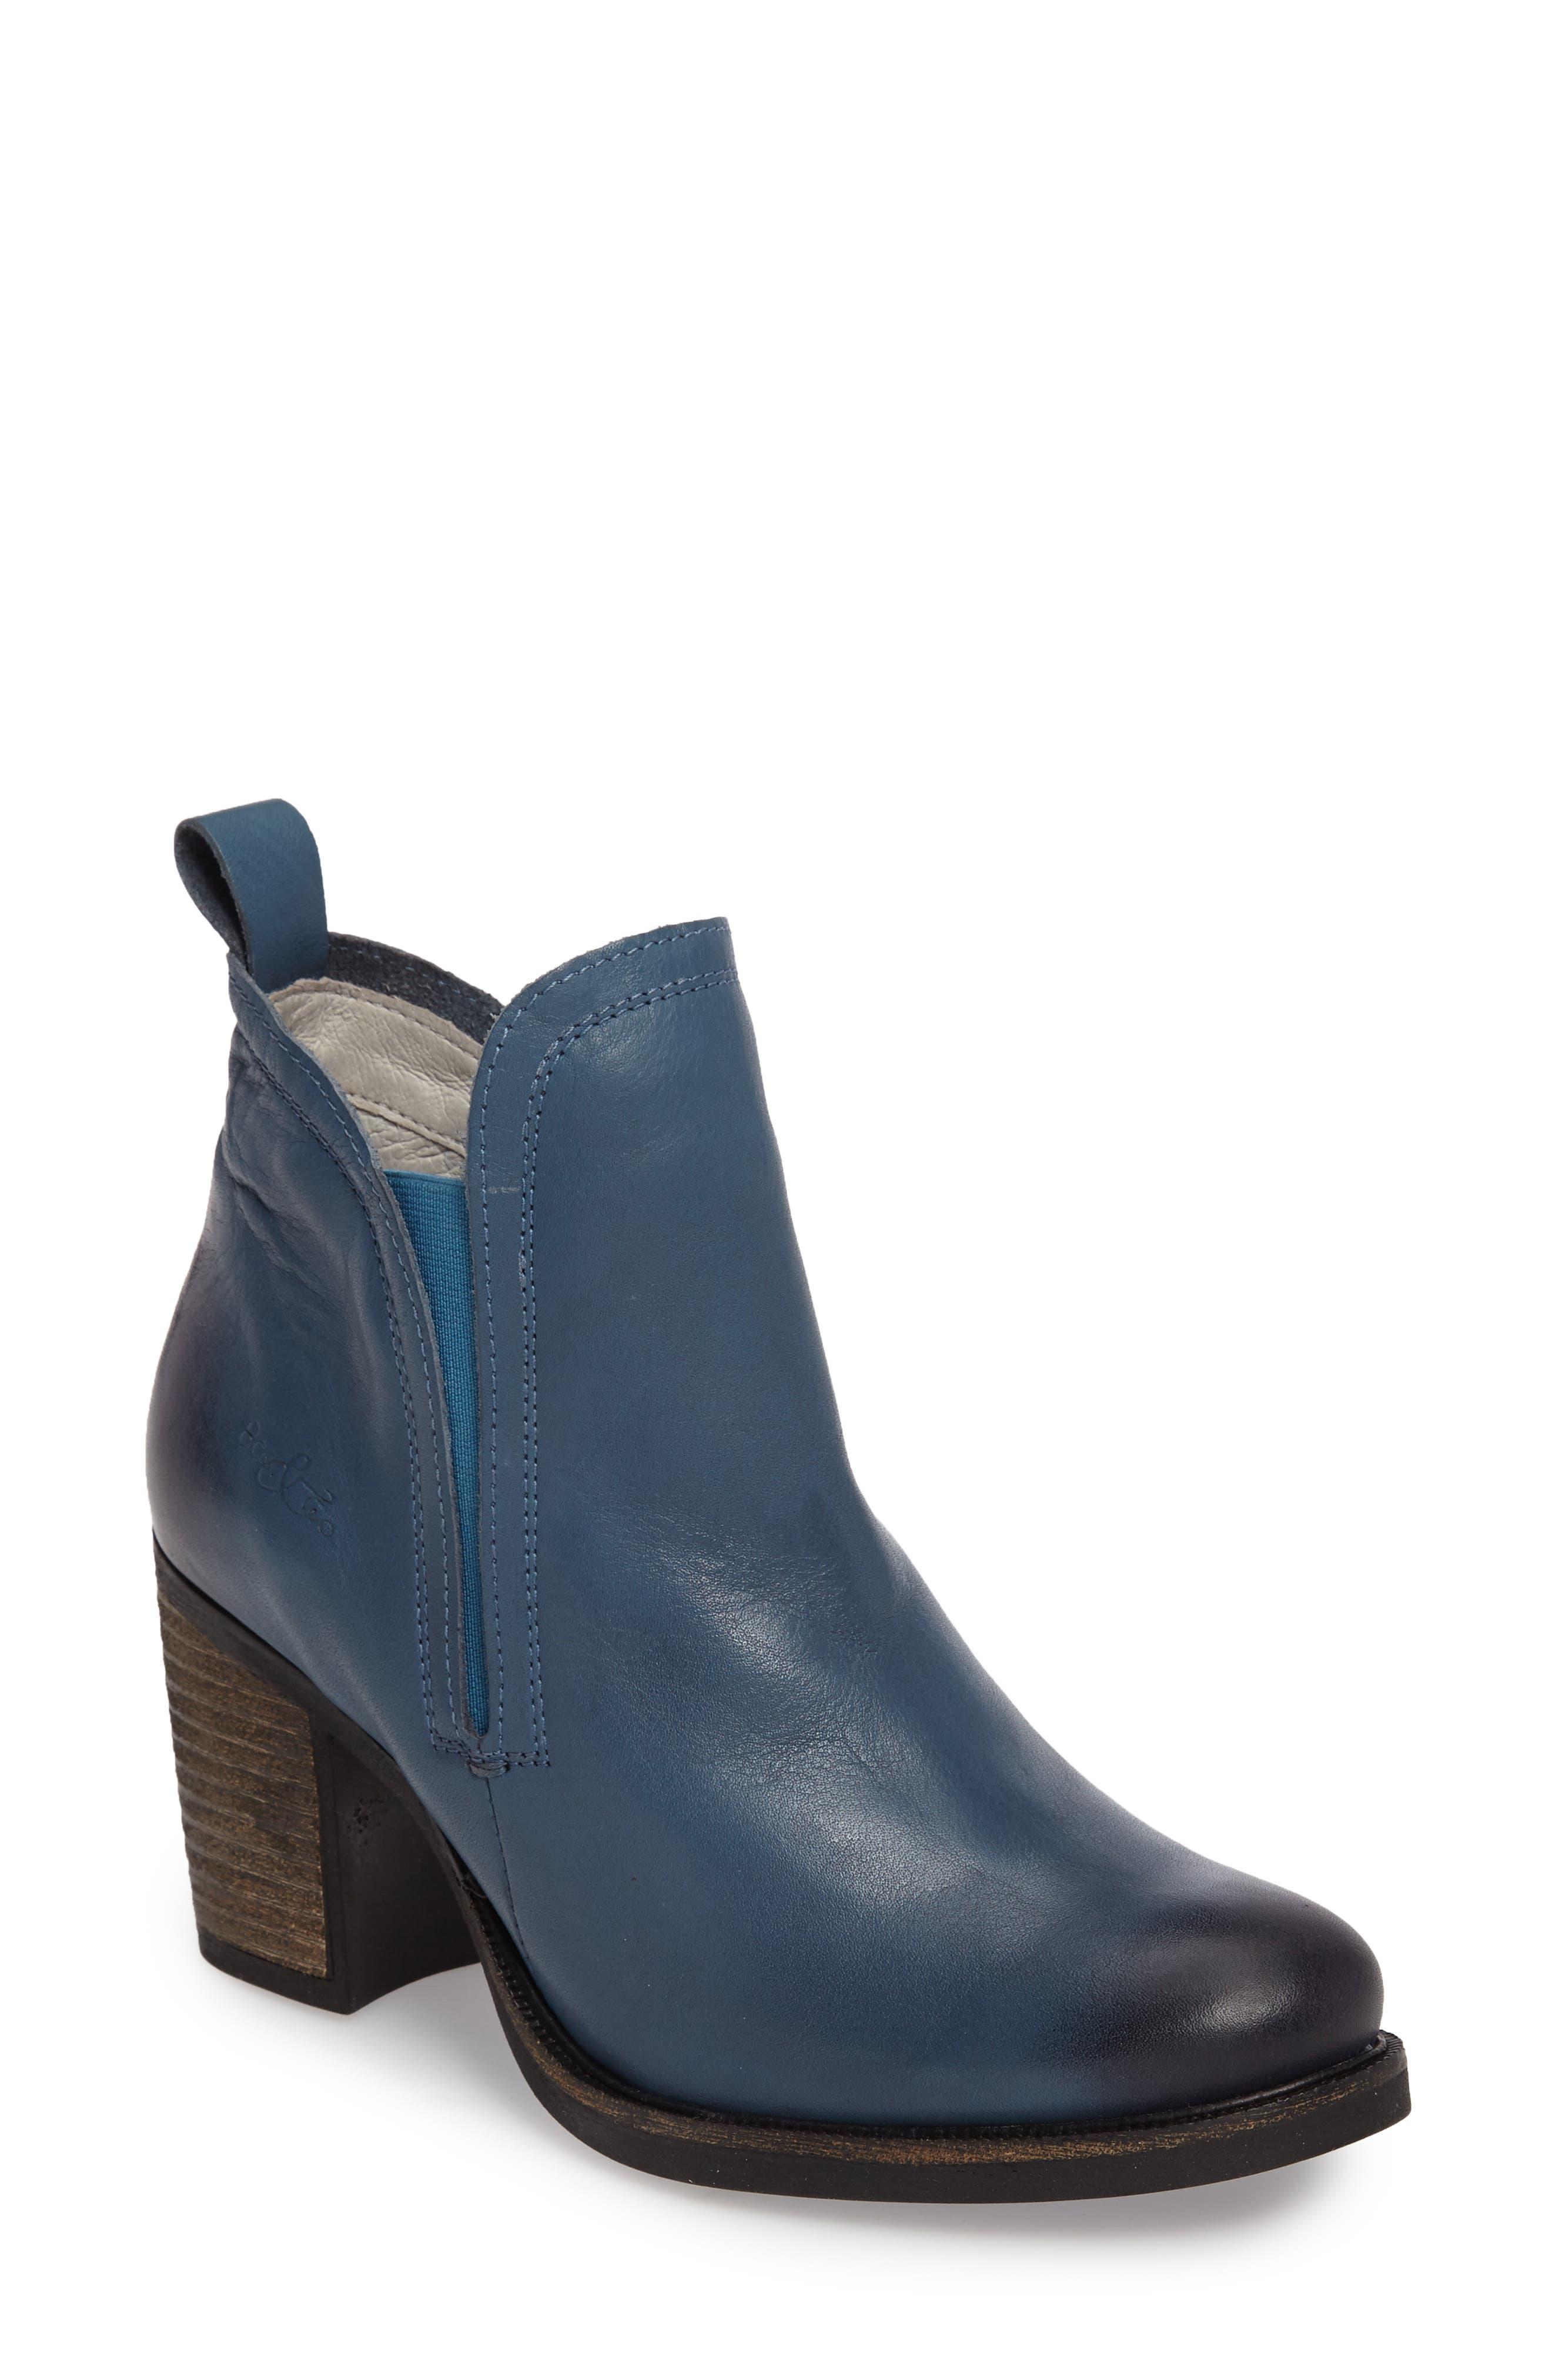 Belfielding Waterproof Chelsea Boot,                             Main thumbnail 1, color,                             Jeans/ Black Leather